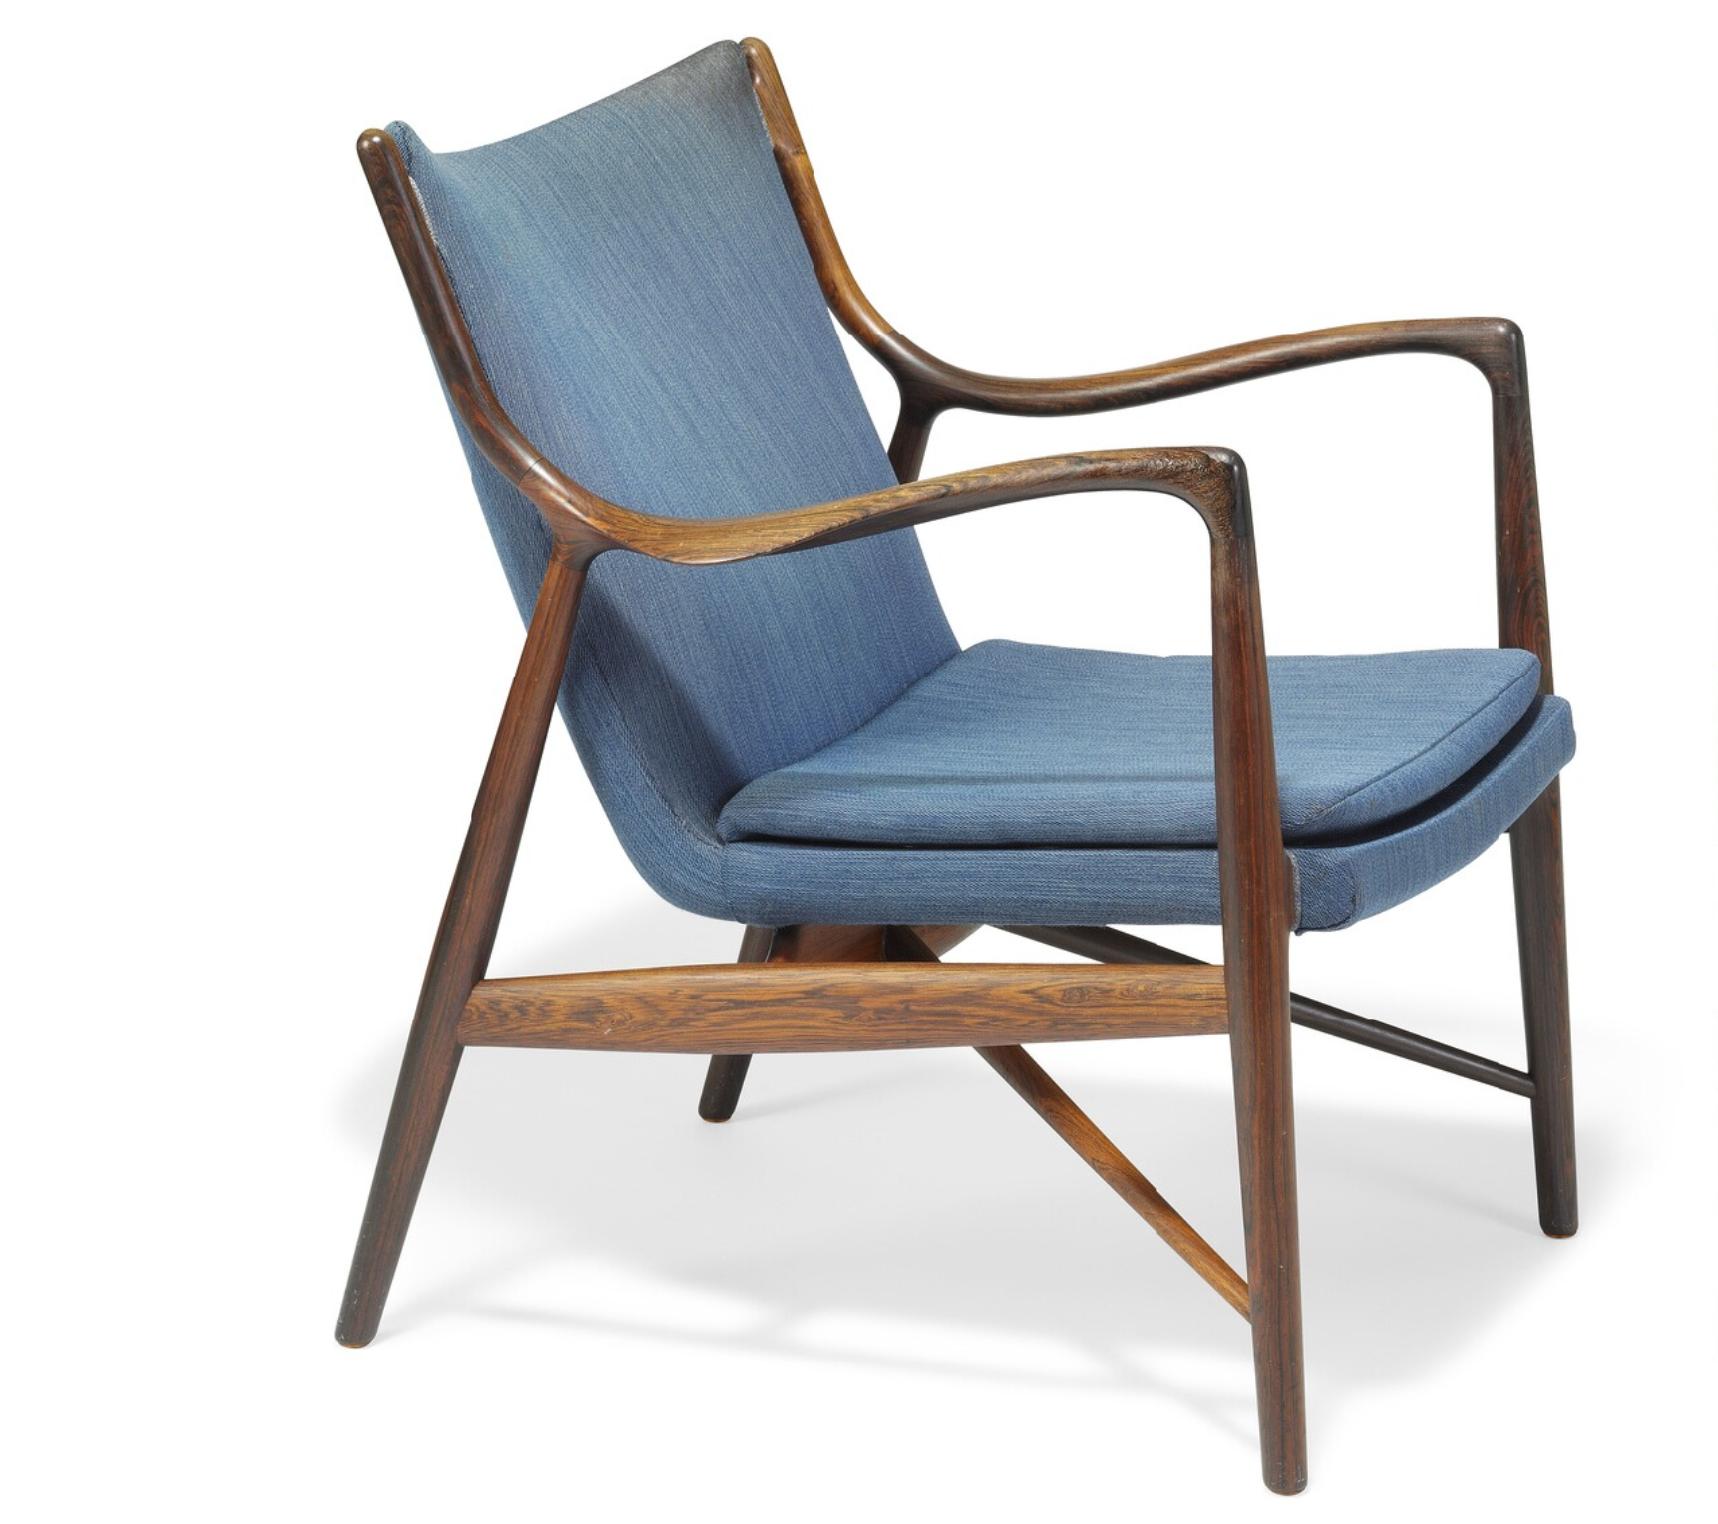 Finn Juhl // Niels Vodder// NV45. A Brazilian Rosewood Easy Chair. Dänische  MöbelModernes MobilarStuhl DesignMöbeldesignDänisches ...